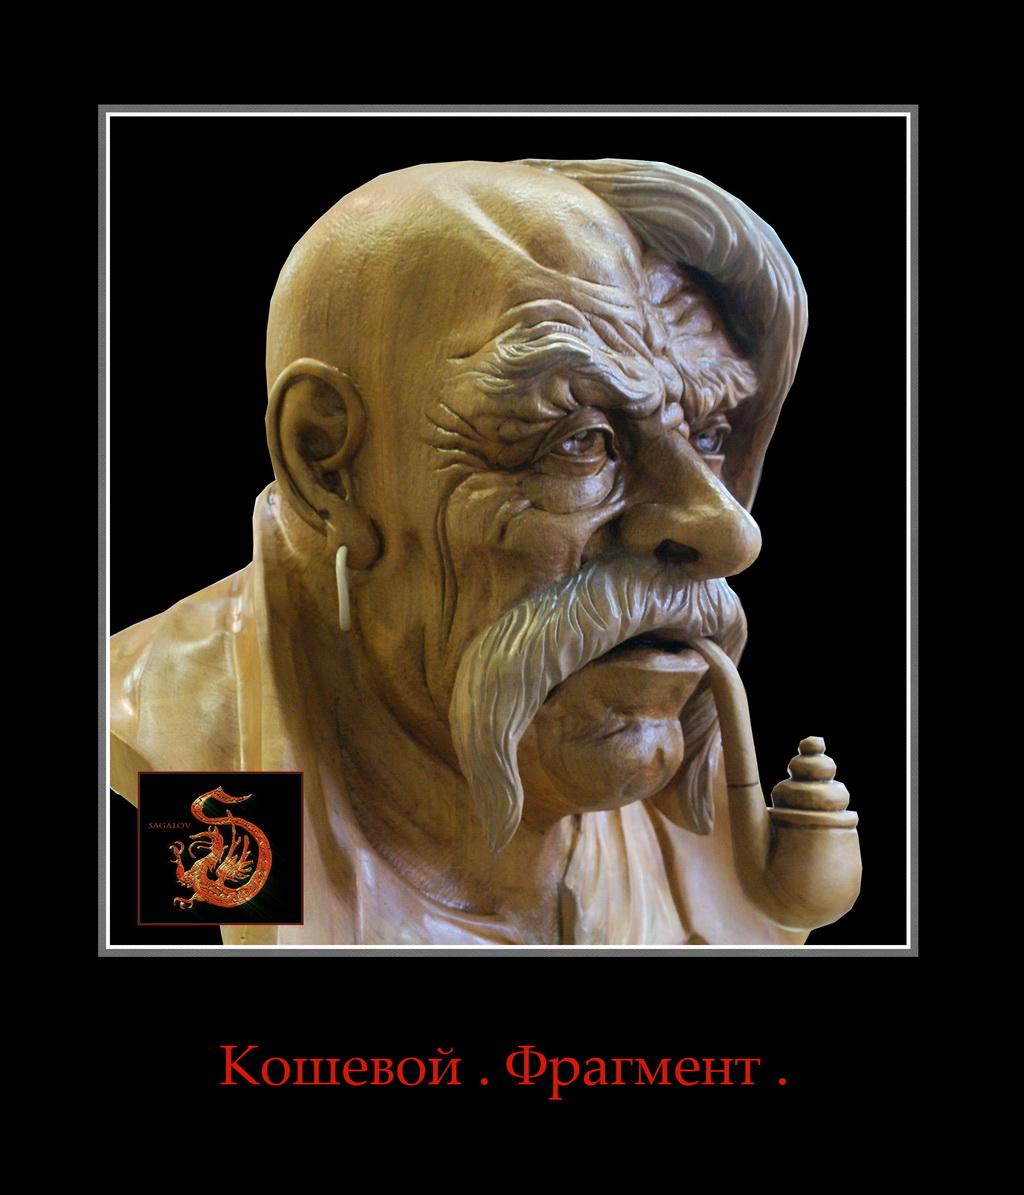 http://s4.uploads.ru/boXhO.jpg